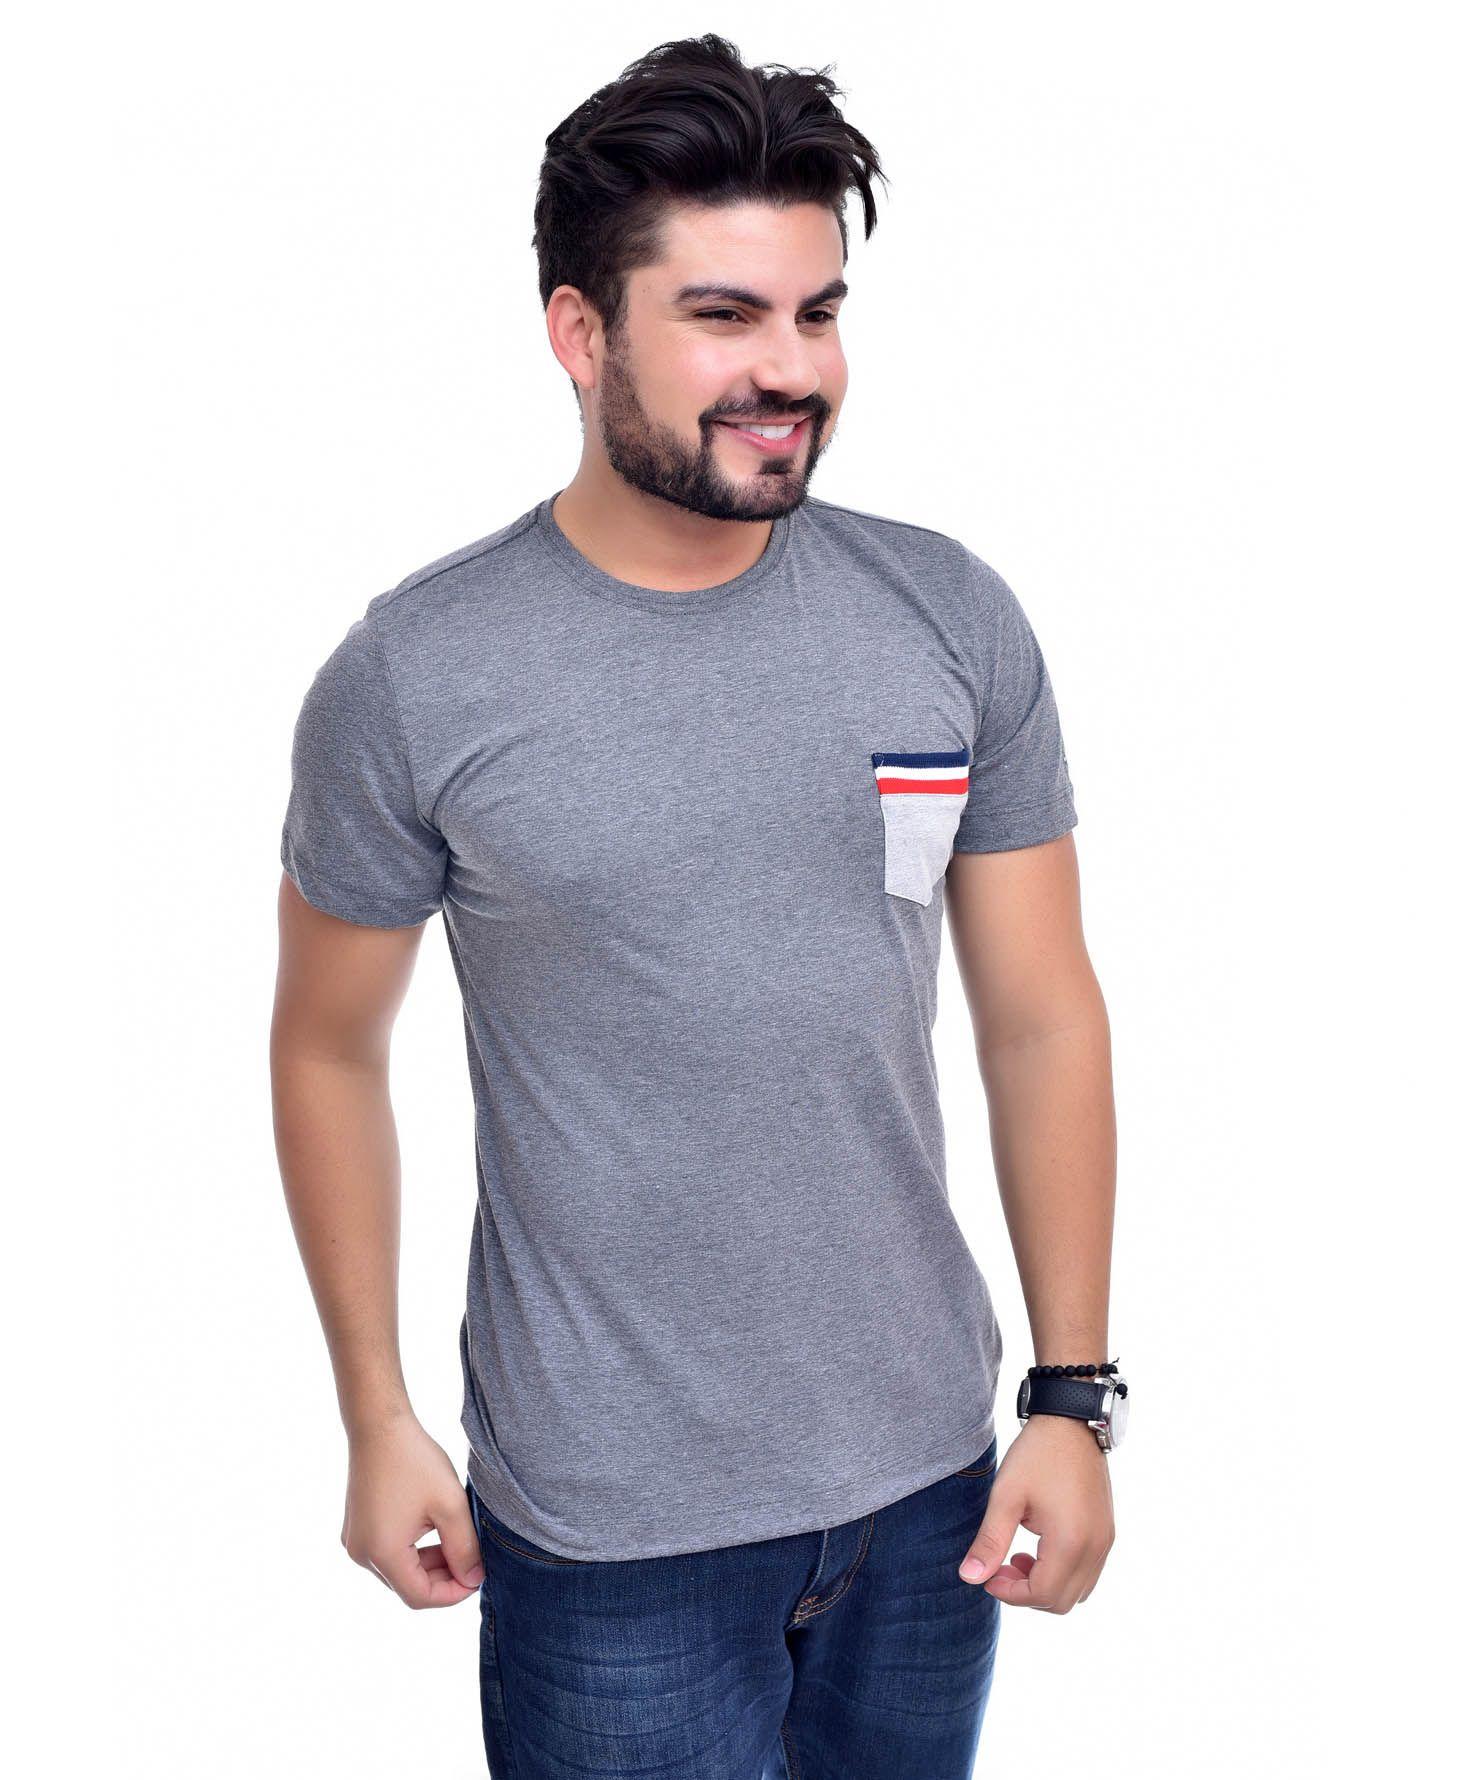 Camiseta Bolso TH Mescla Escuro / MC